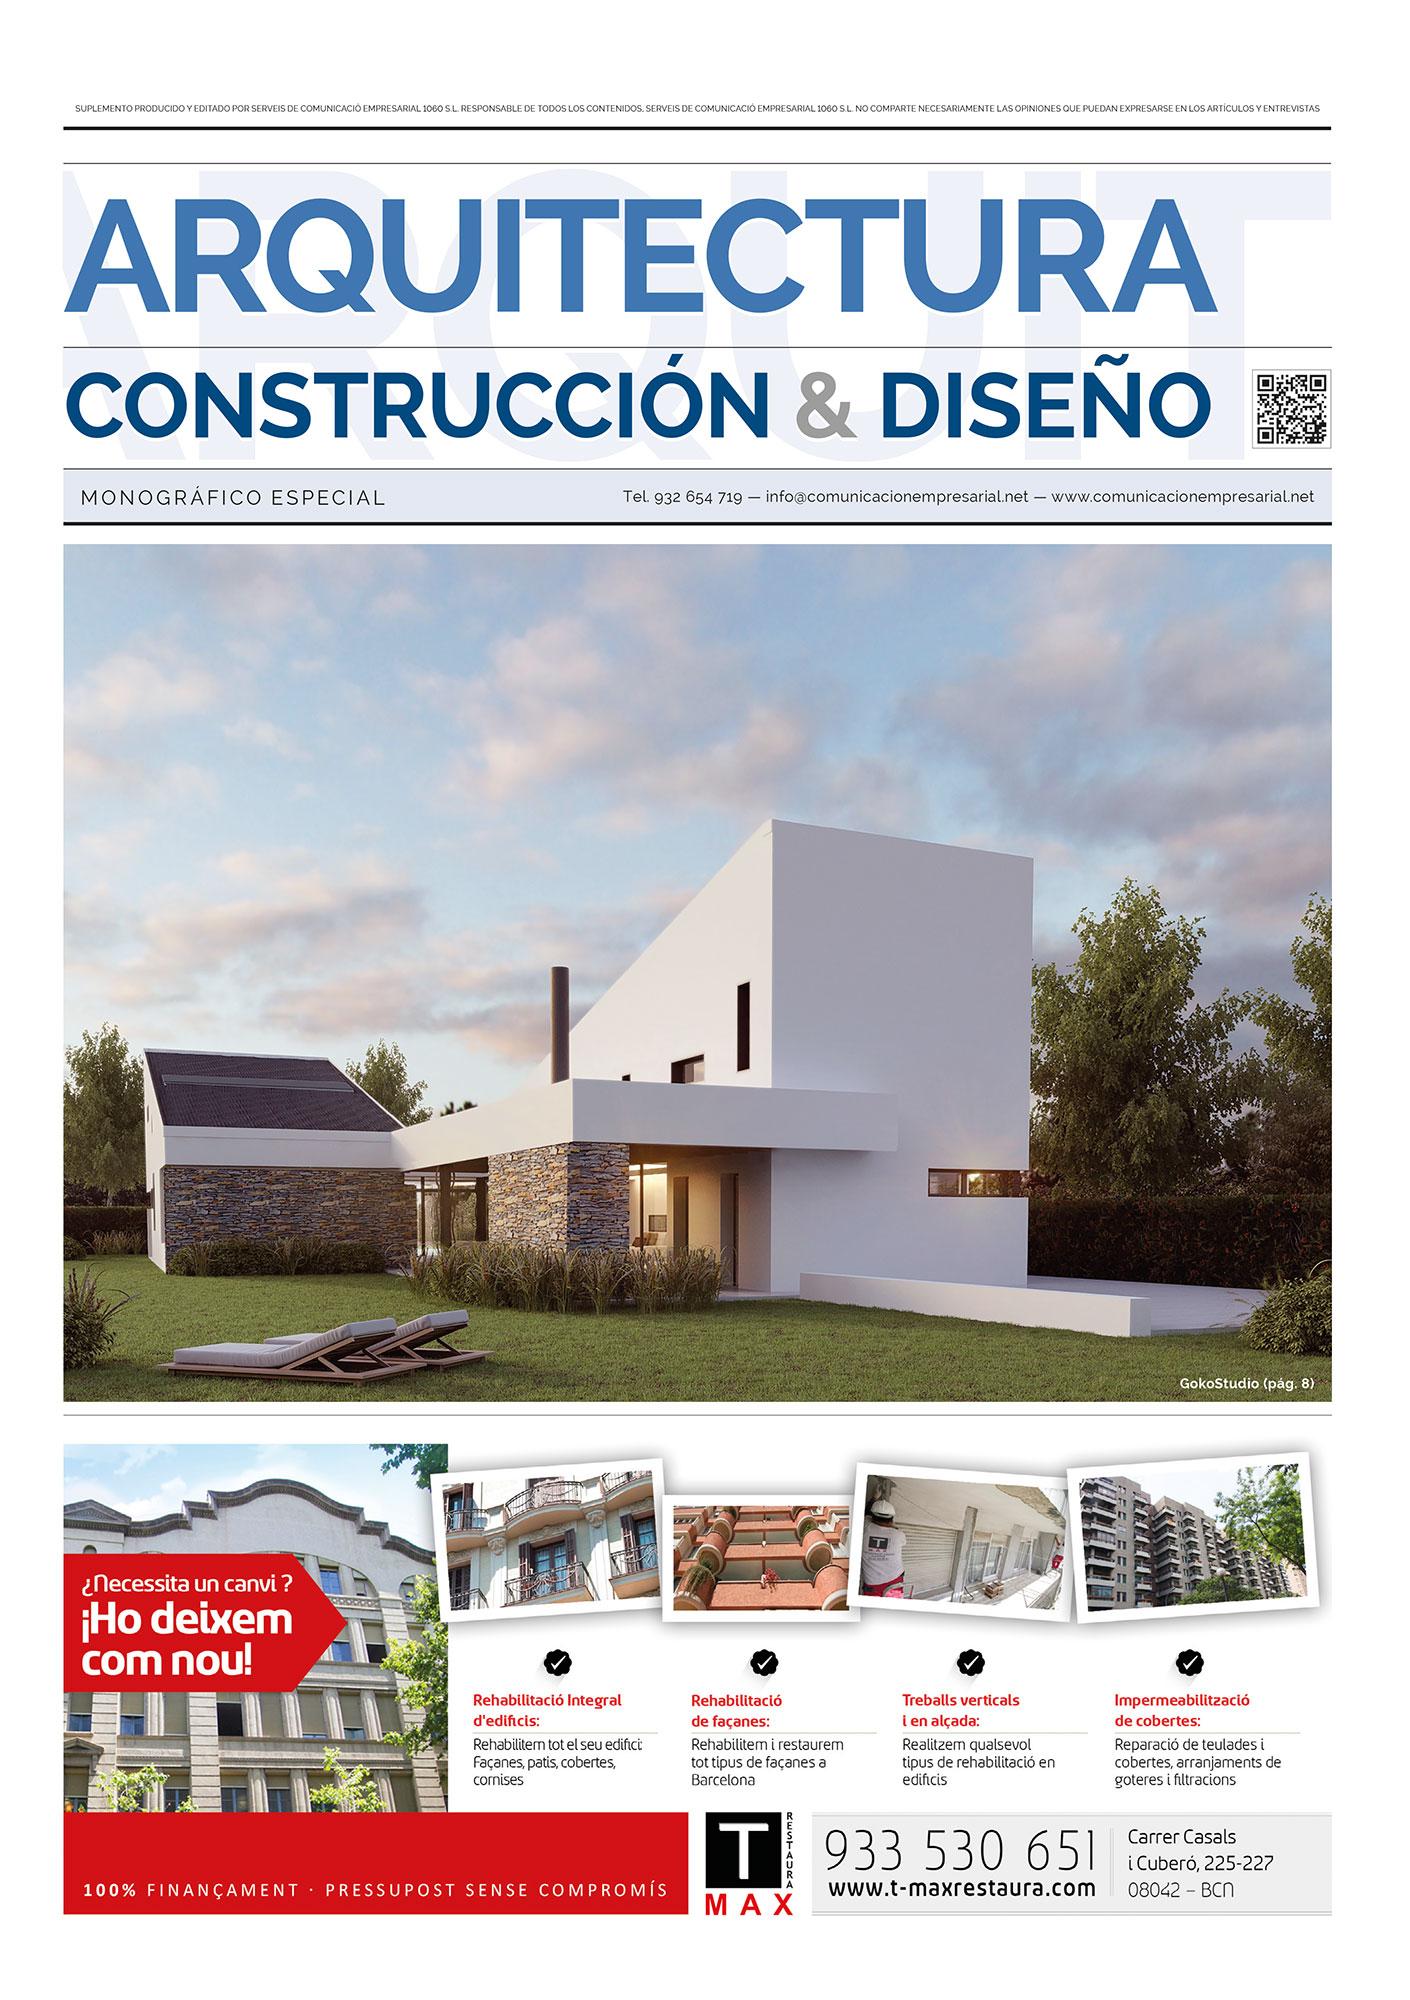 arquitectura construcci n y dise o la vanguardia